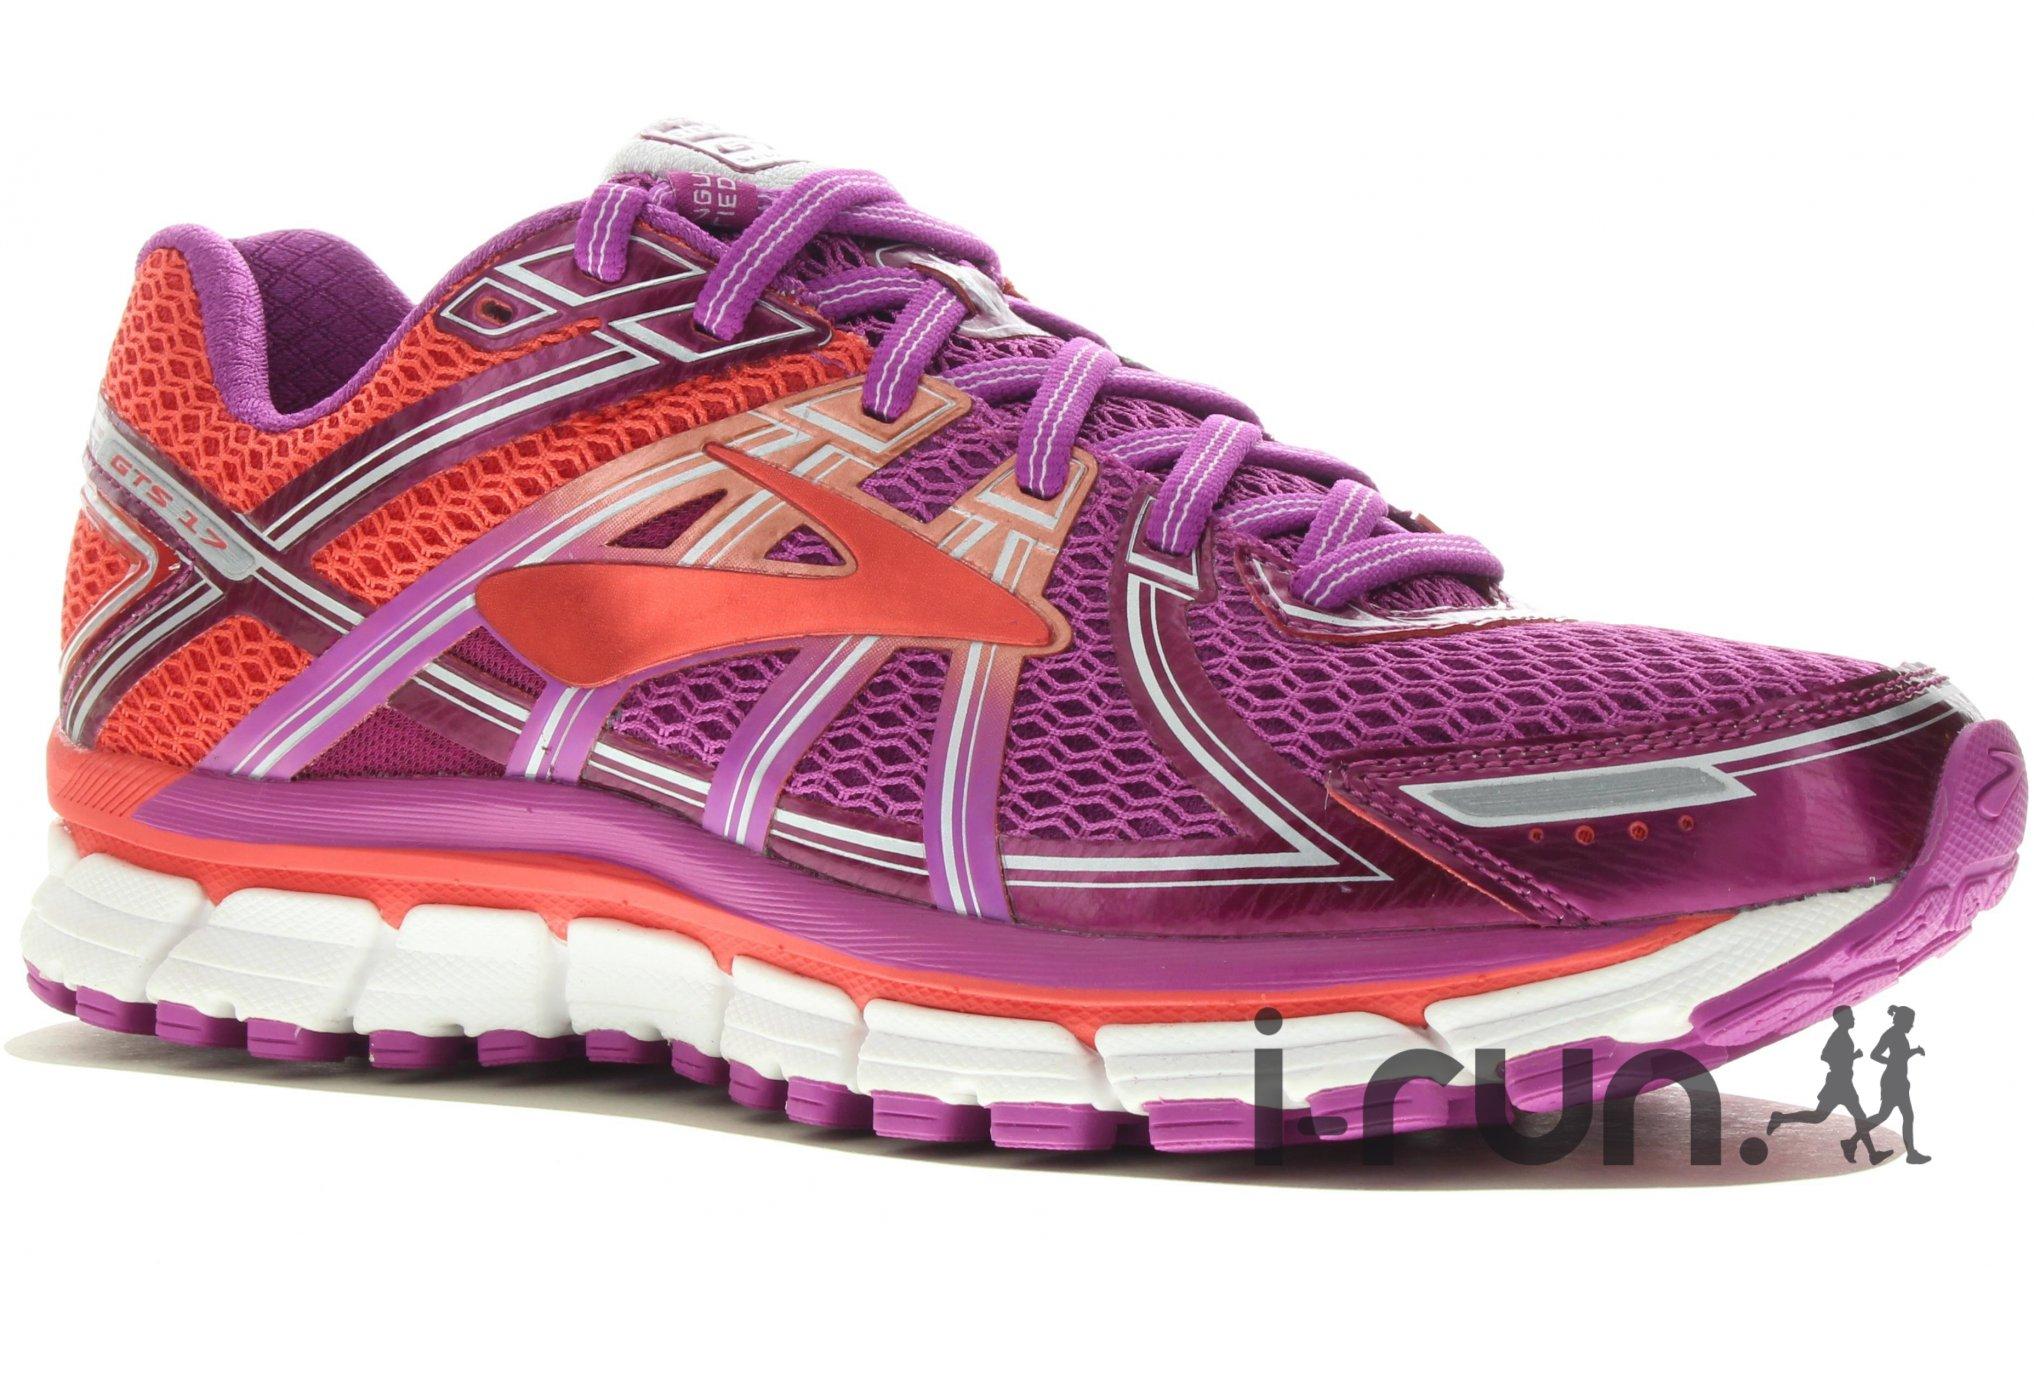 Brooks adrenaline gts 17 w chaussures running femme